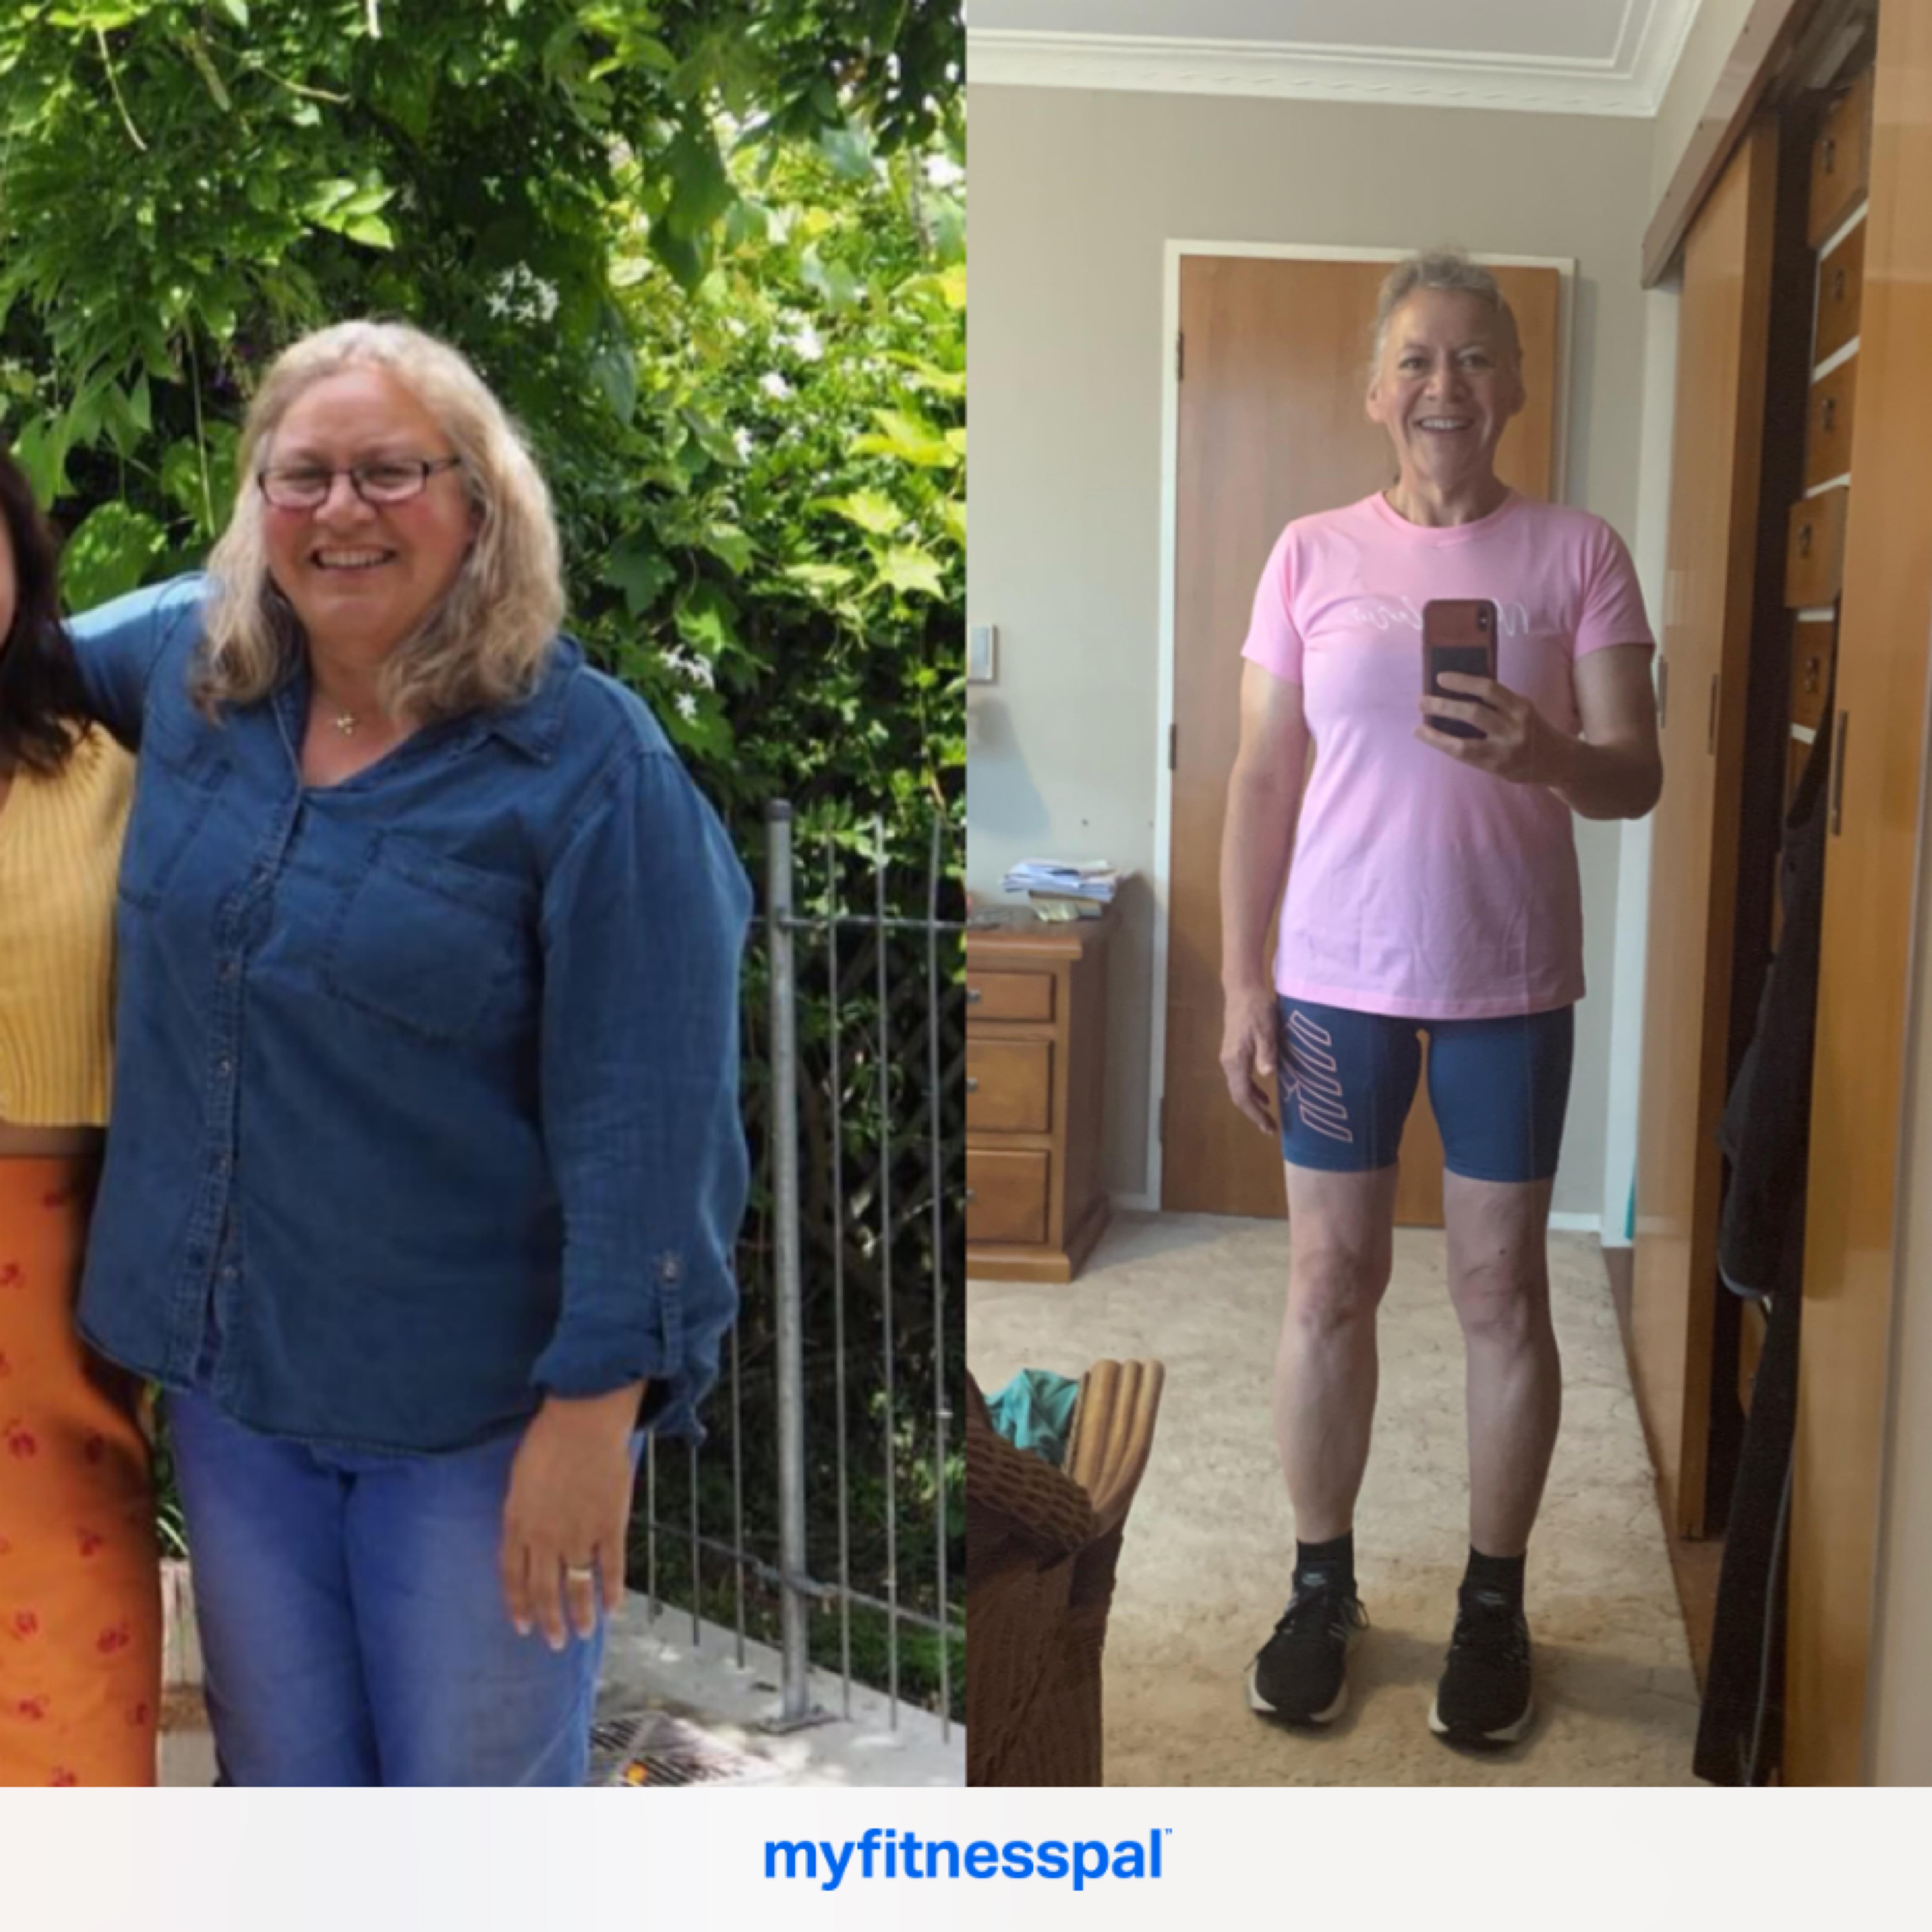 Progress Pics of 90 lbs Weight Loss 5 feet 5 Female 222 lbs to 132 lbs